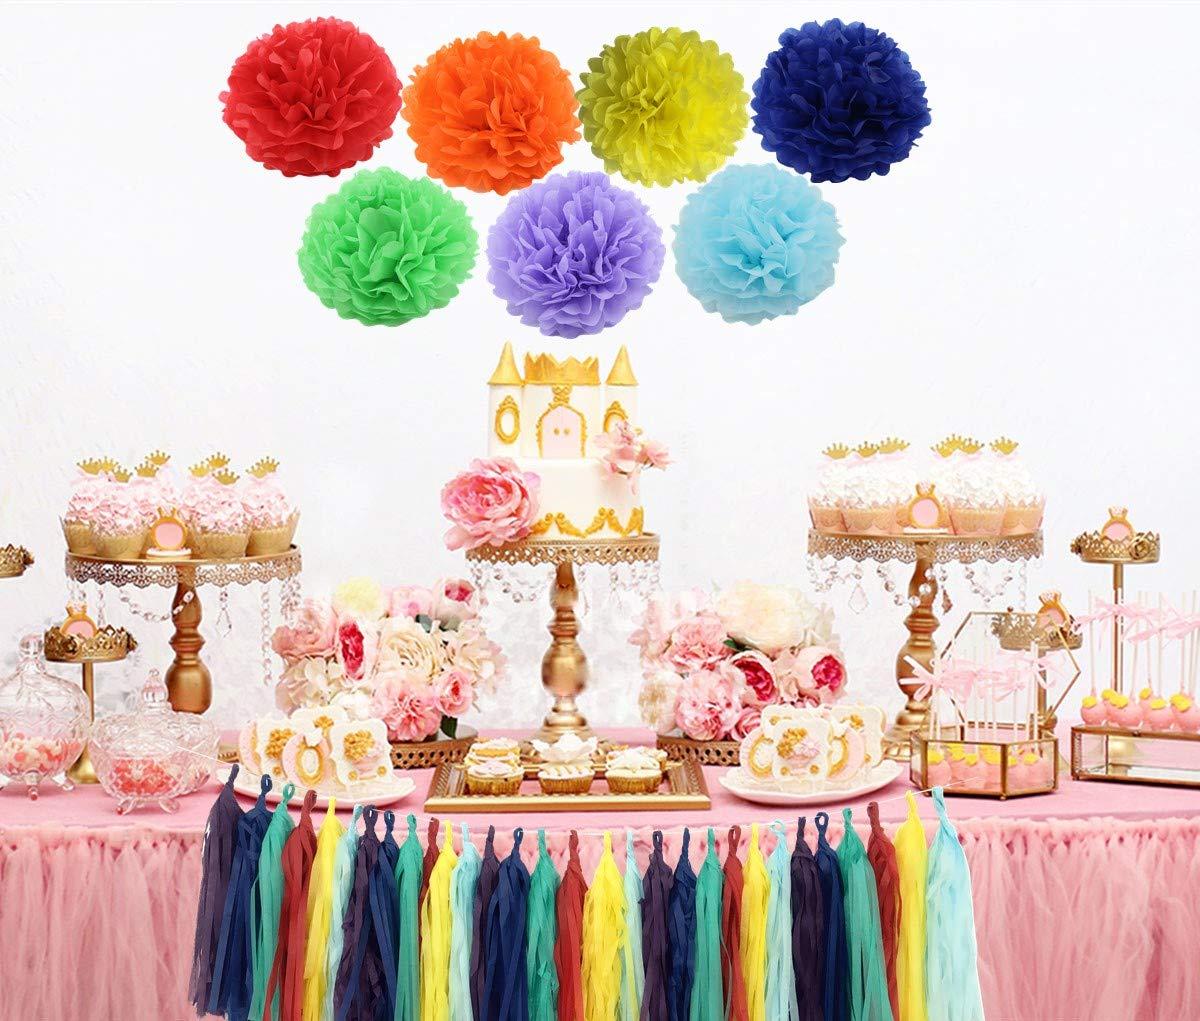 10 Tissue Paper Flower Pom Pom Tassel Garland 37PCS Rainbow Party Decoration Kit Baby Shower Bridal Shower Birthday Colorful Party Supply Set